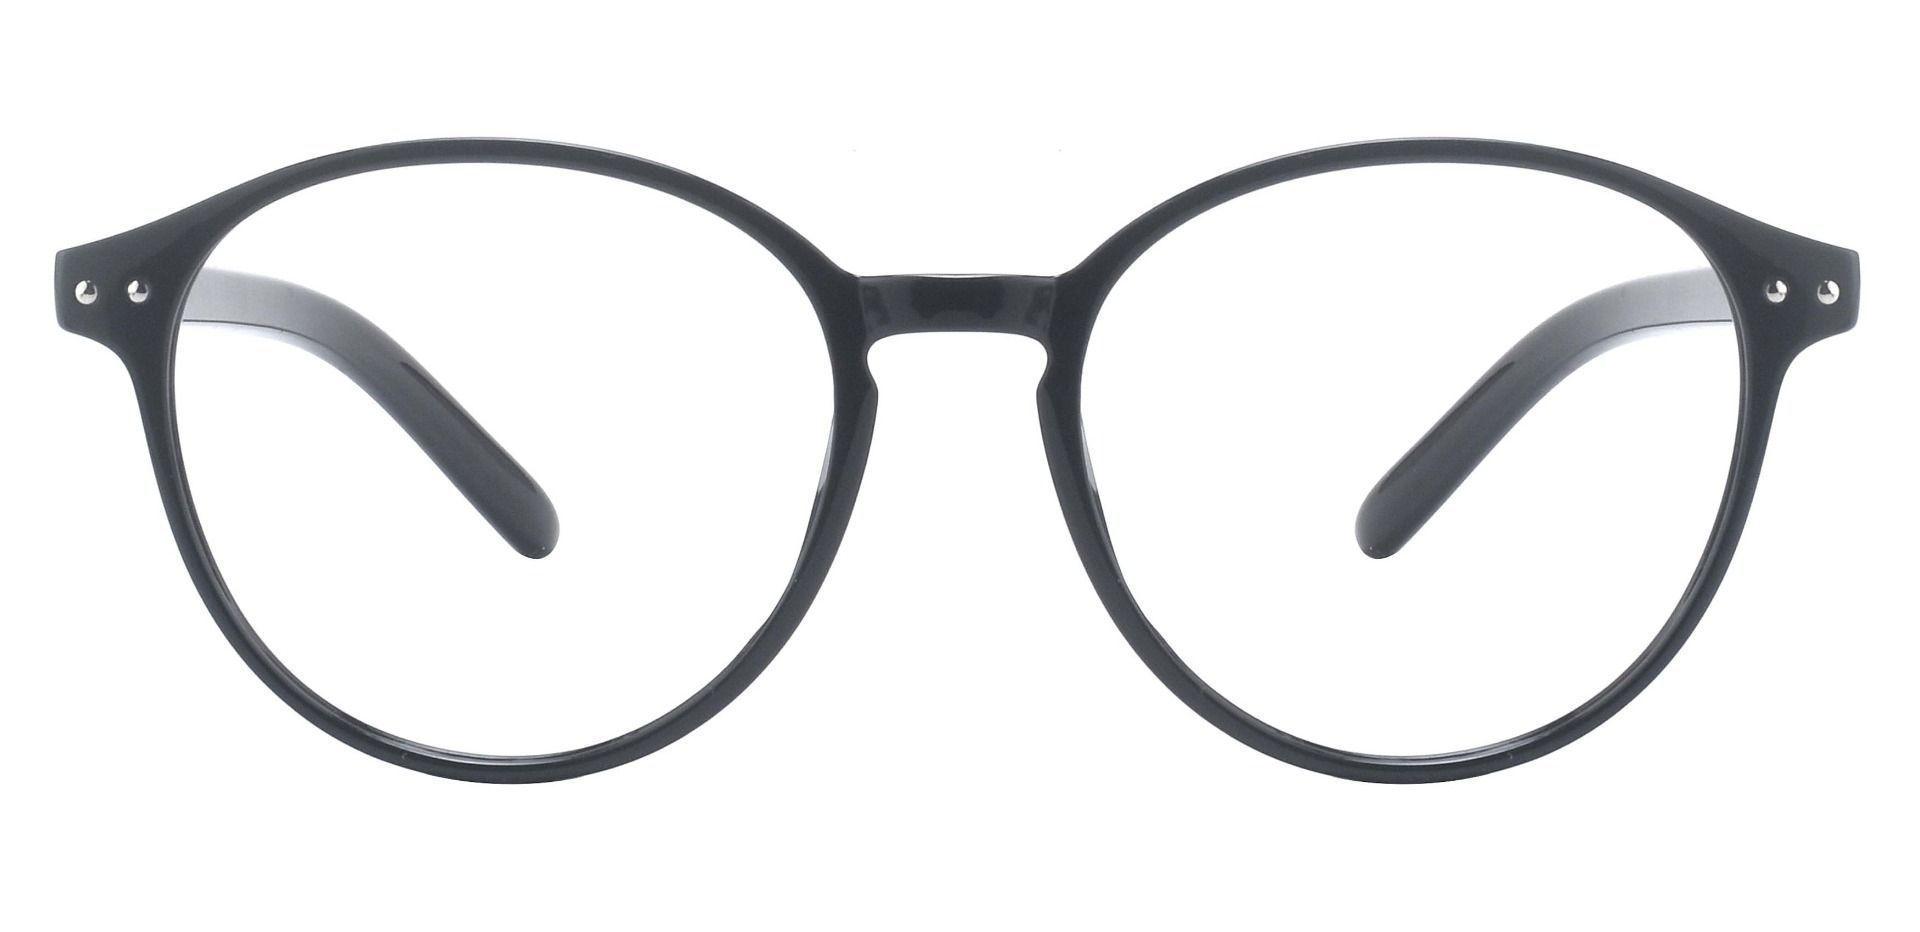 Sanger Round Prescription Glasses - Black